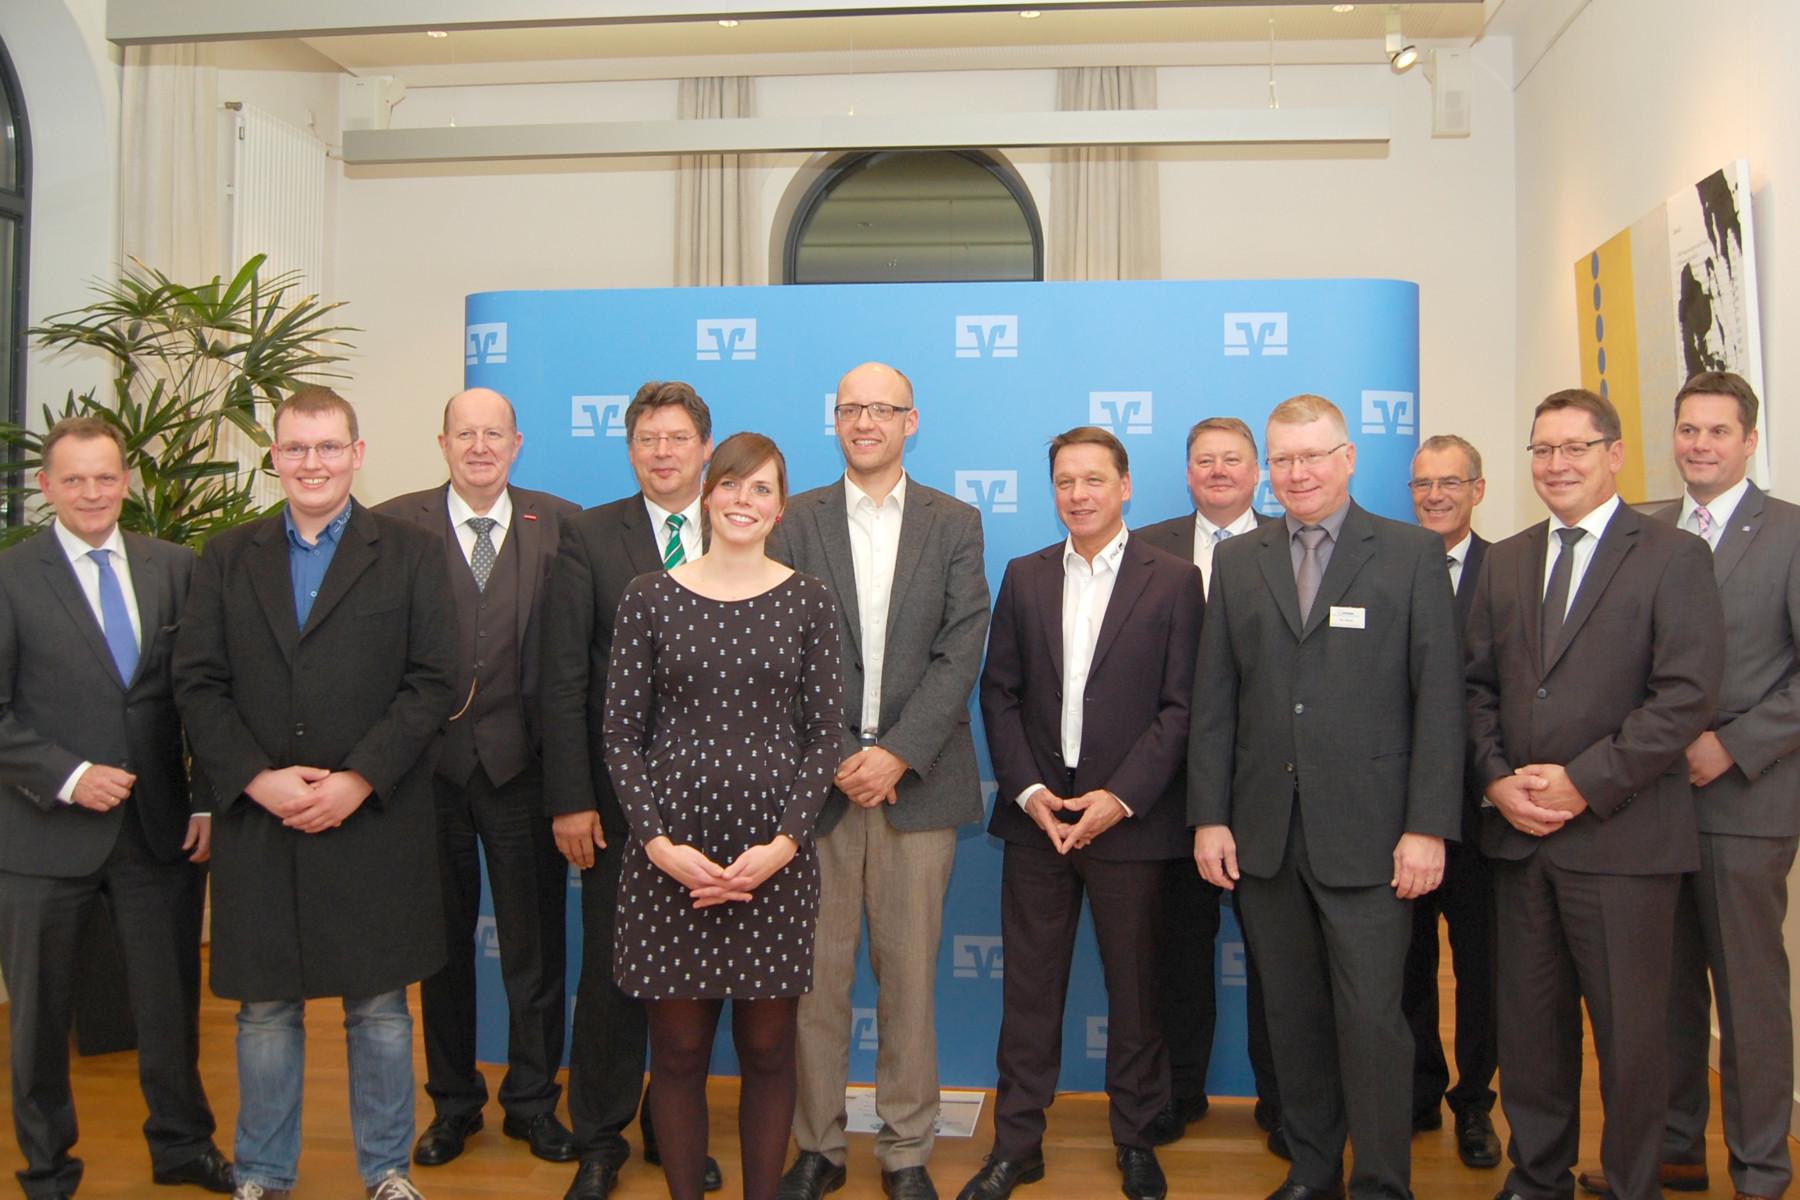 Staal ist Preisträger im VR-Förderpreis Handwerk 2016